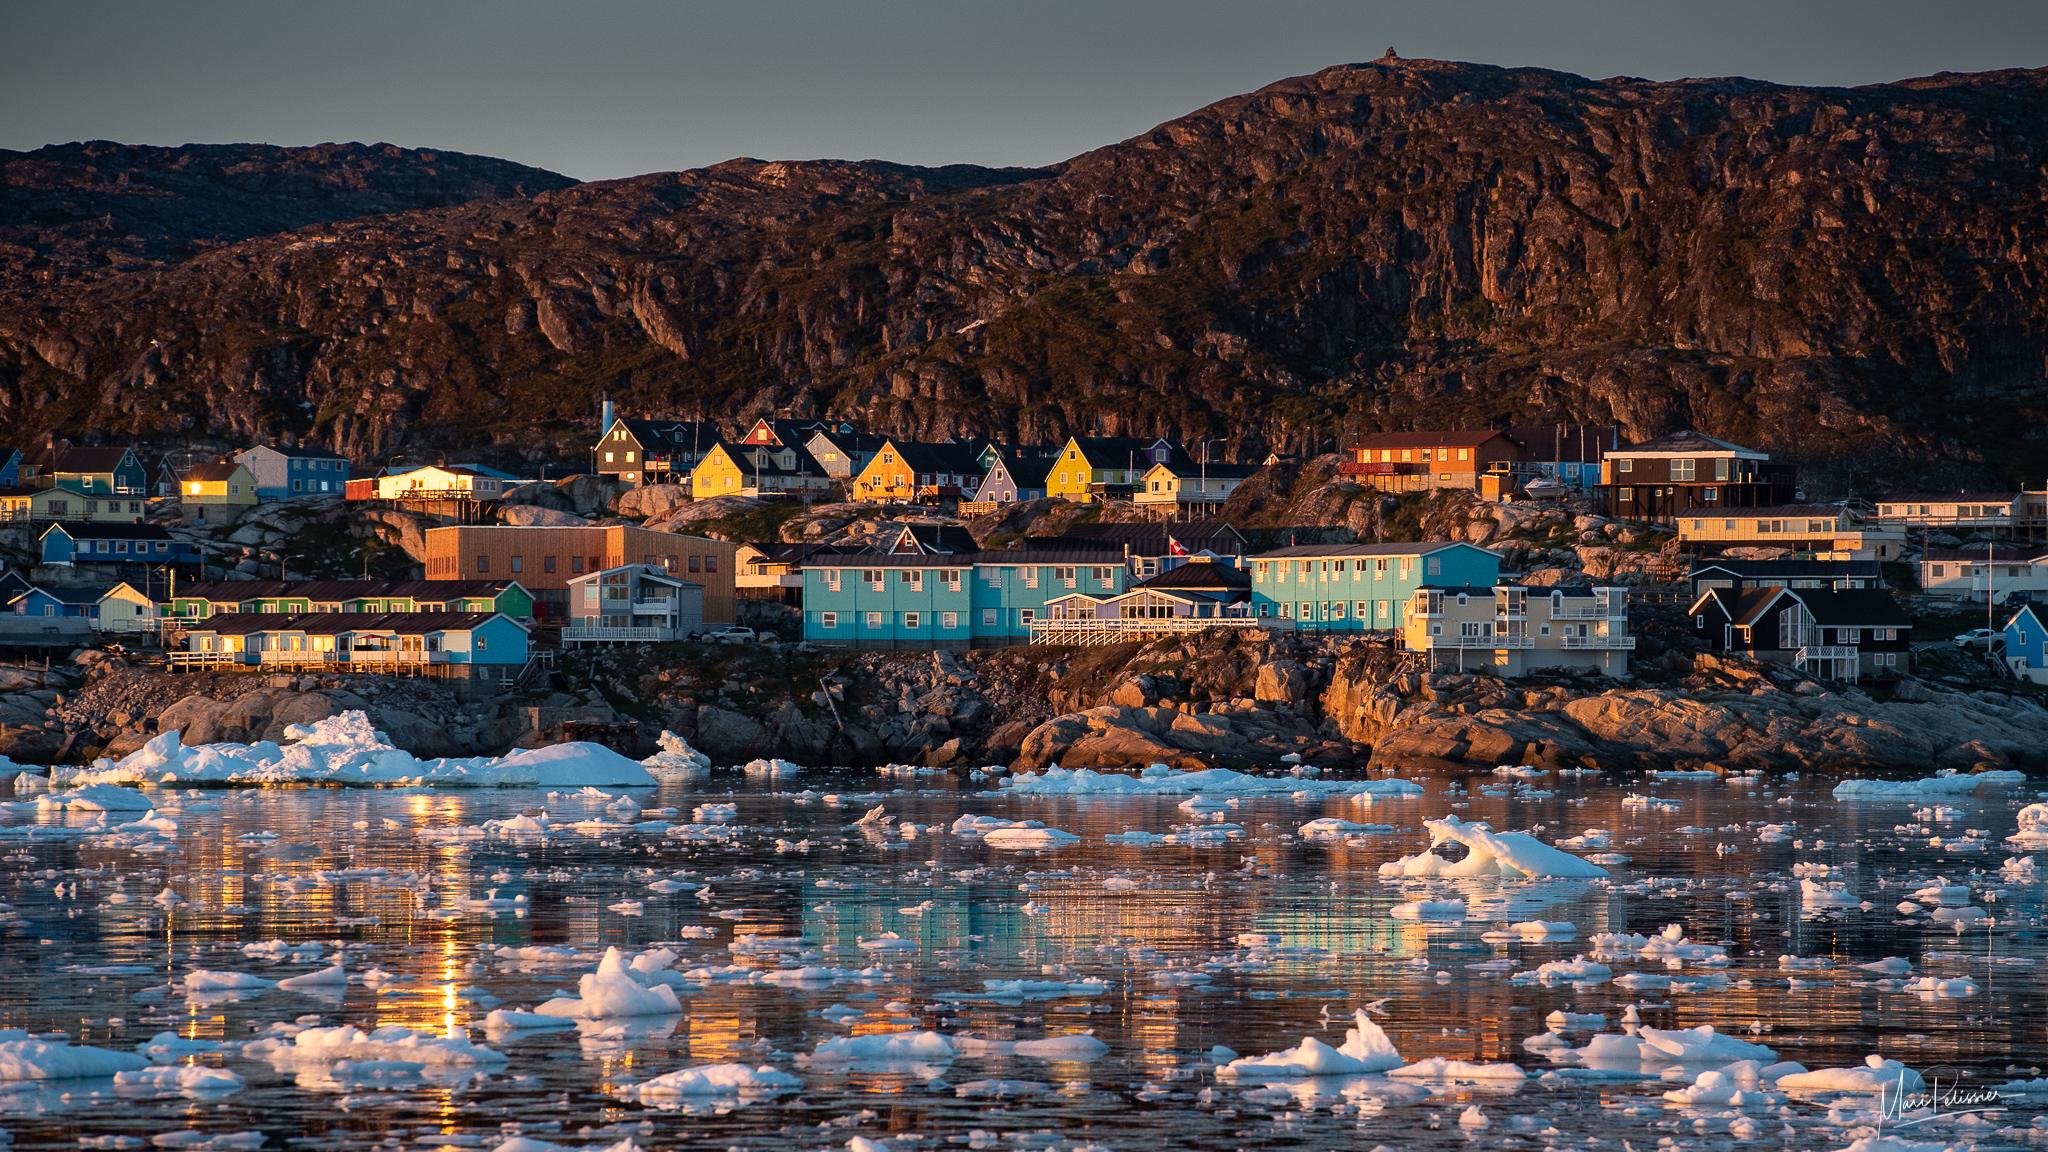 Ilulissat at sunrise from Disko bay, Greenland